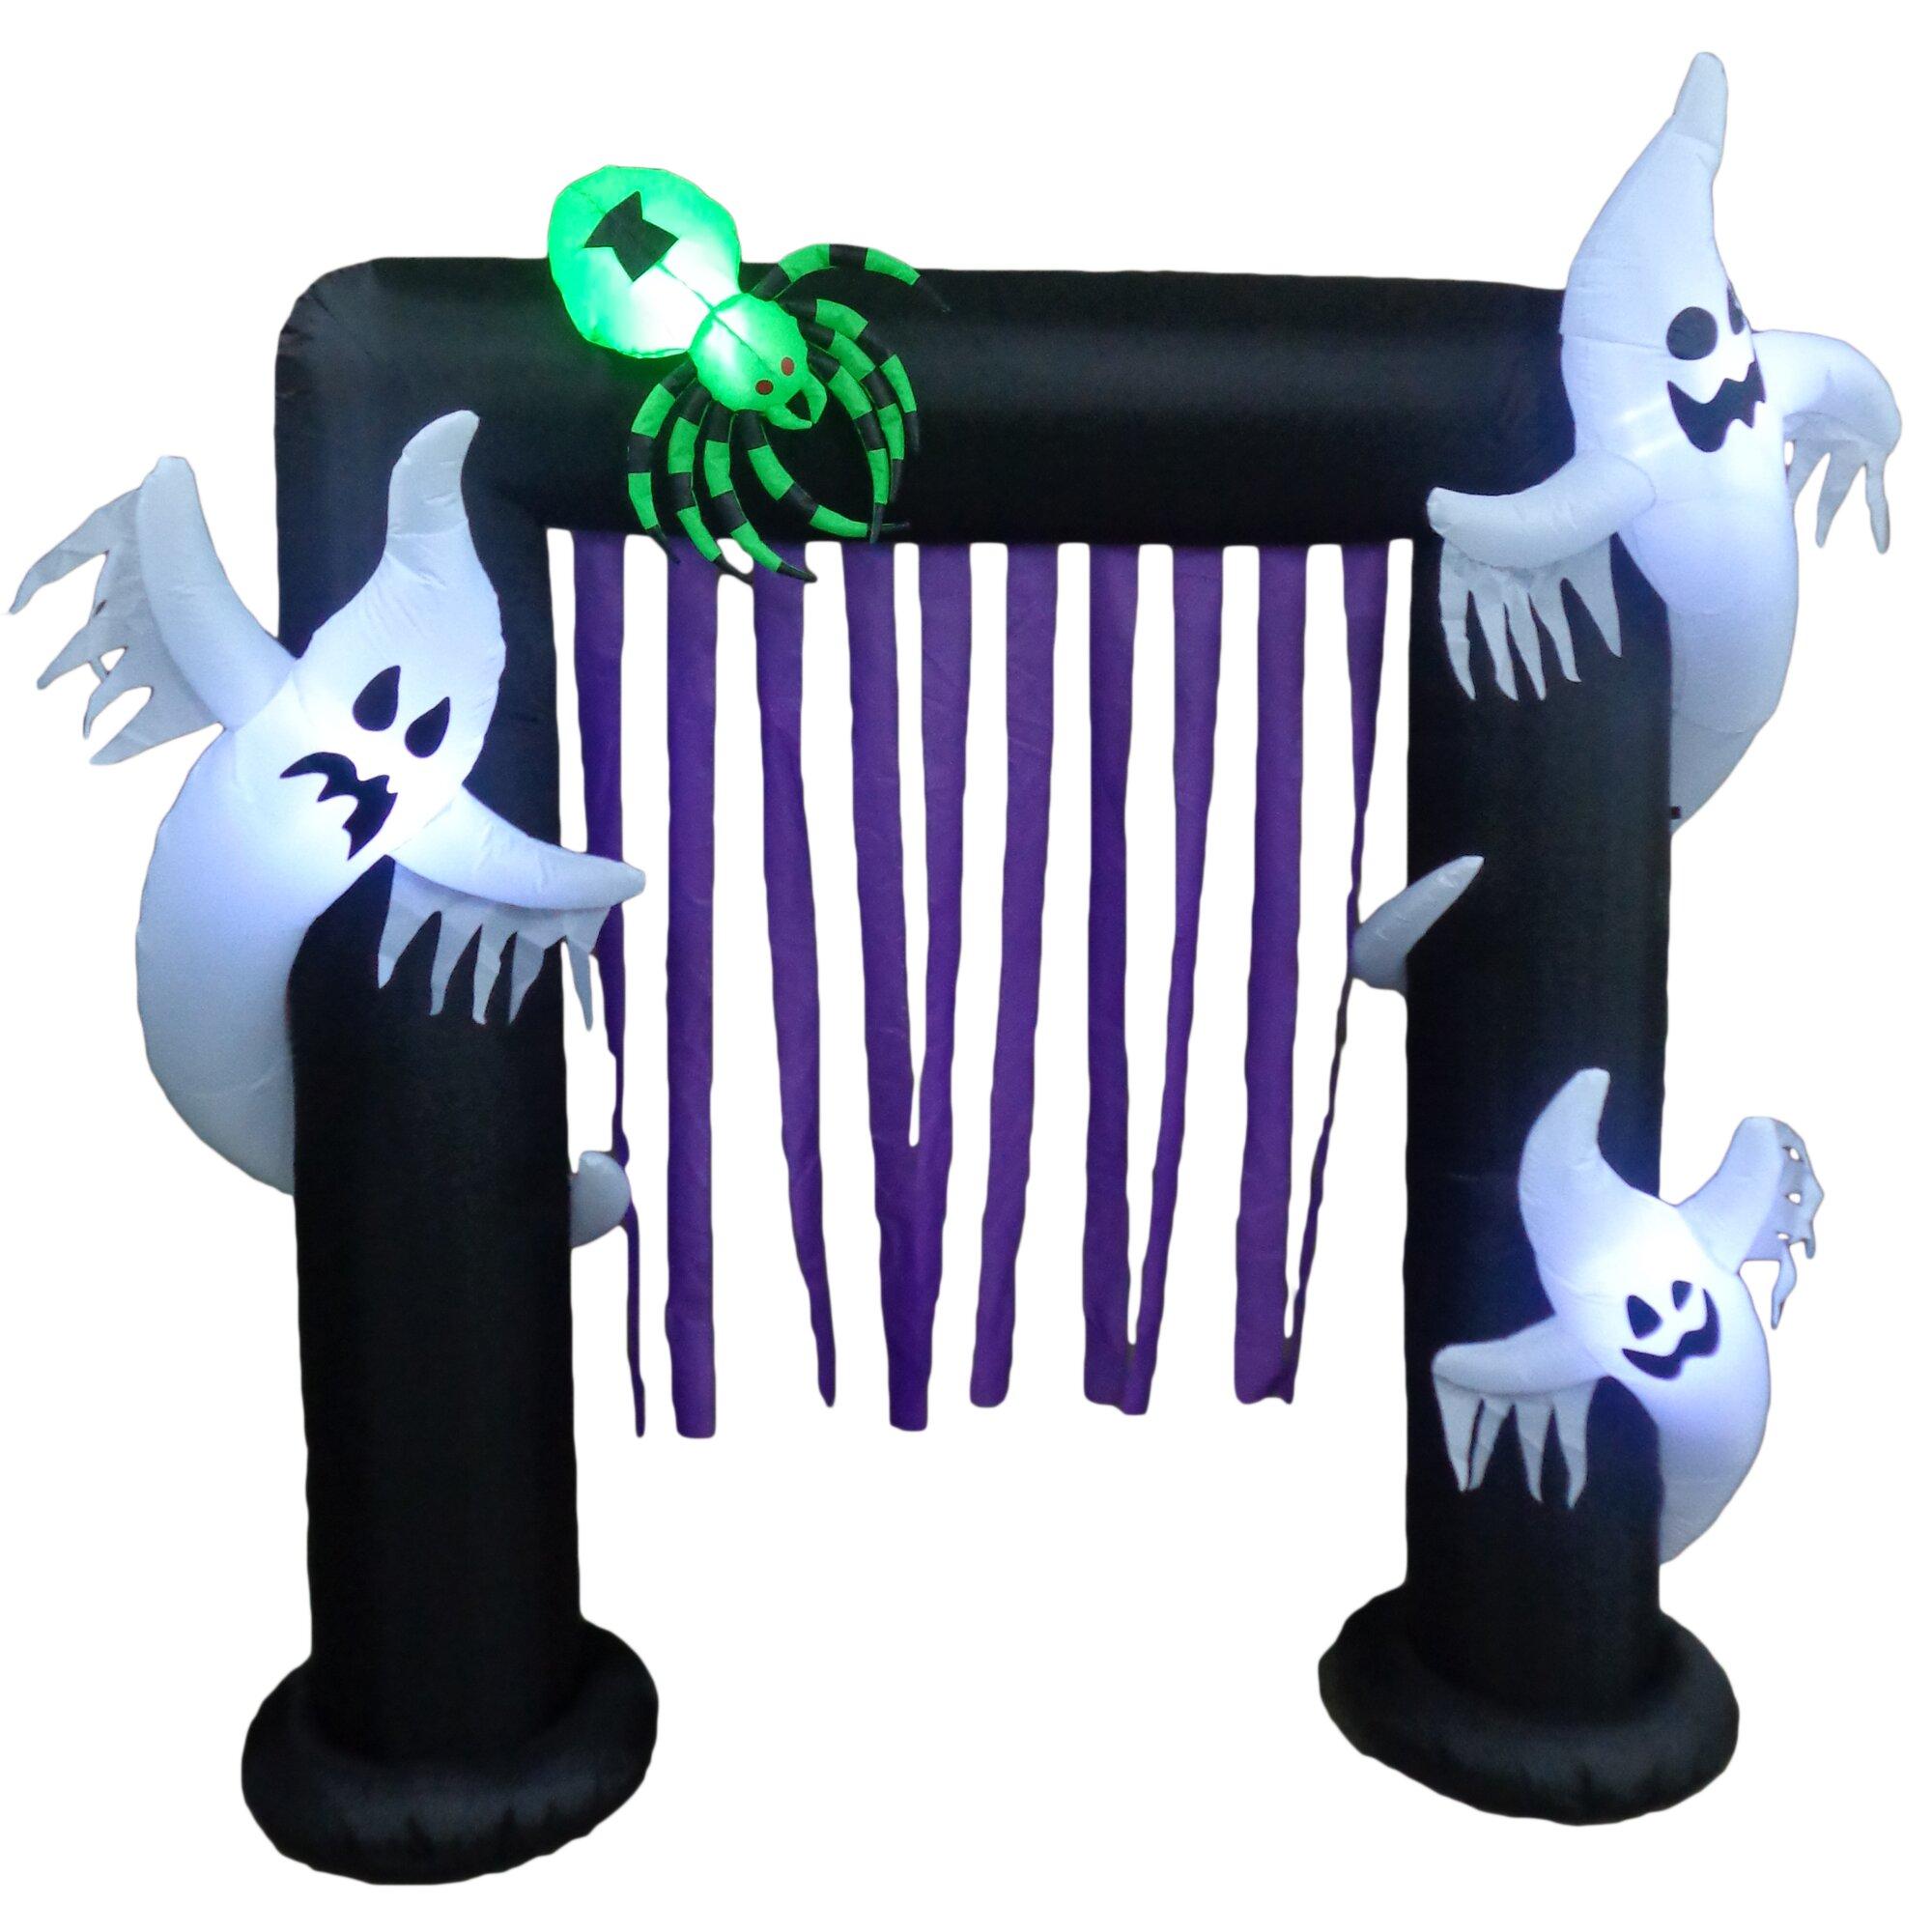 Outdoor inflatable halloween decorations - Bzb Goods Halloween Inflatable Archway Indoor Outdoor Decoration